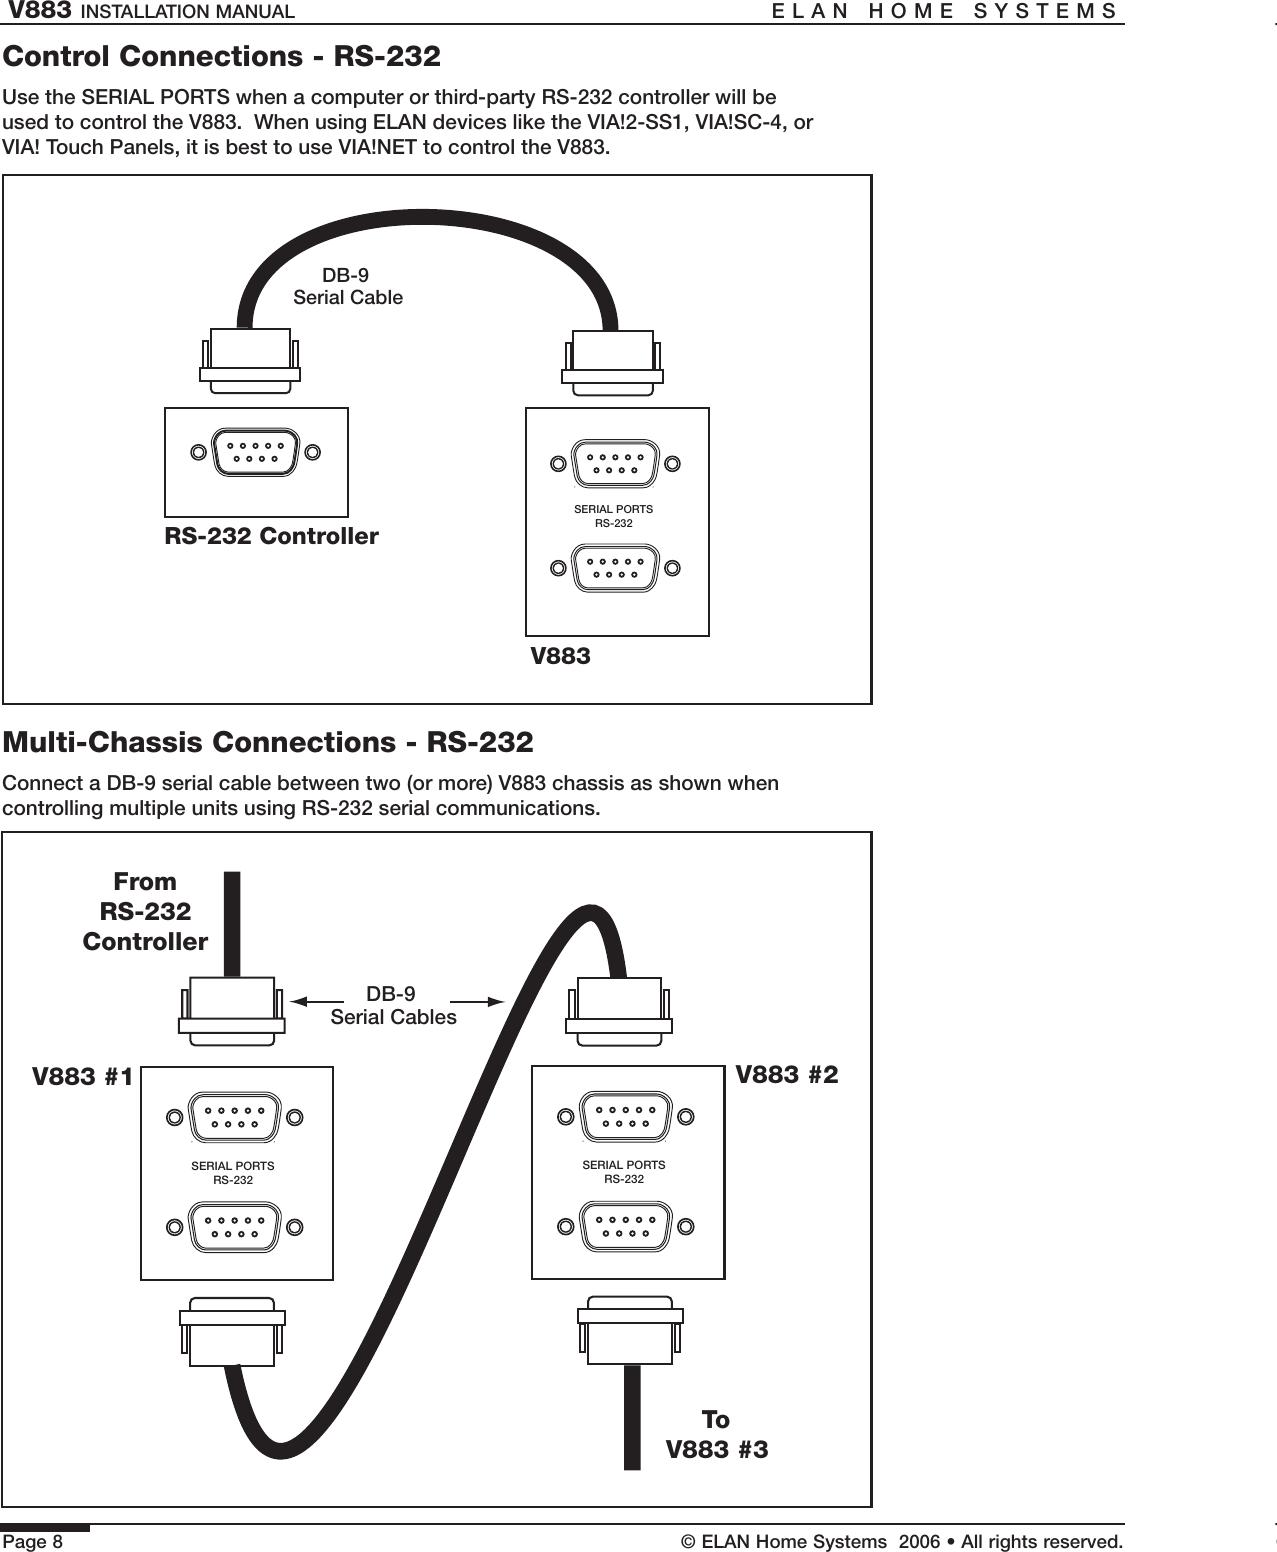 Serial Cable Diagram